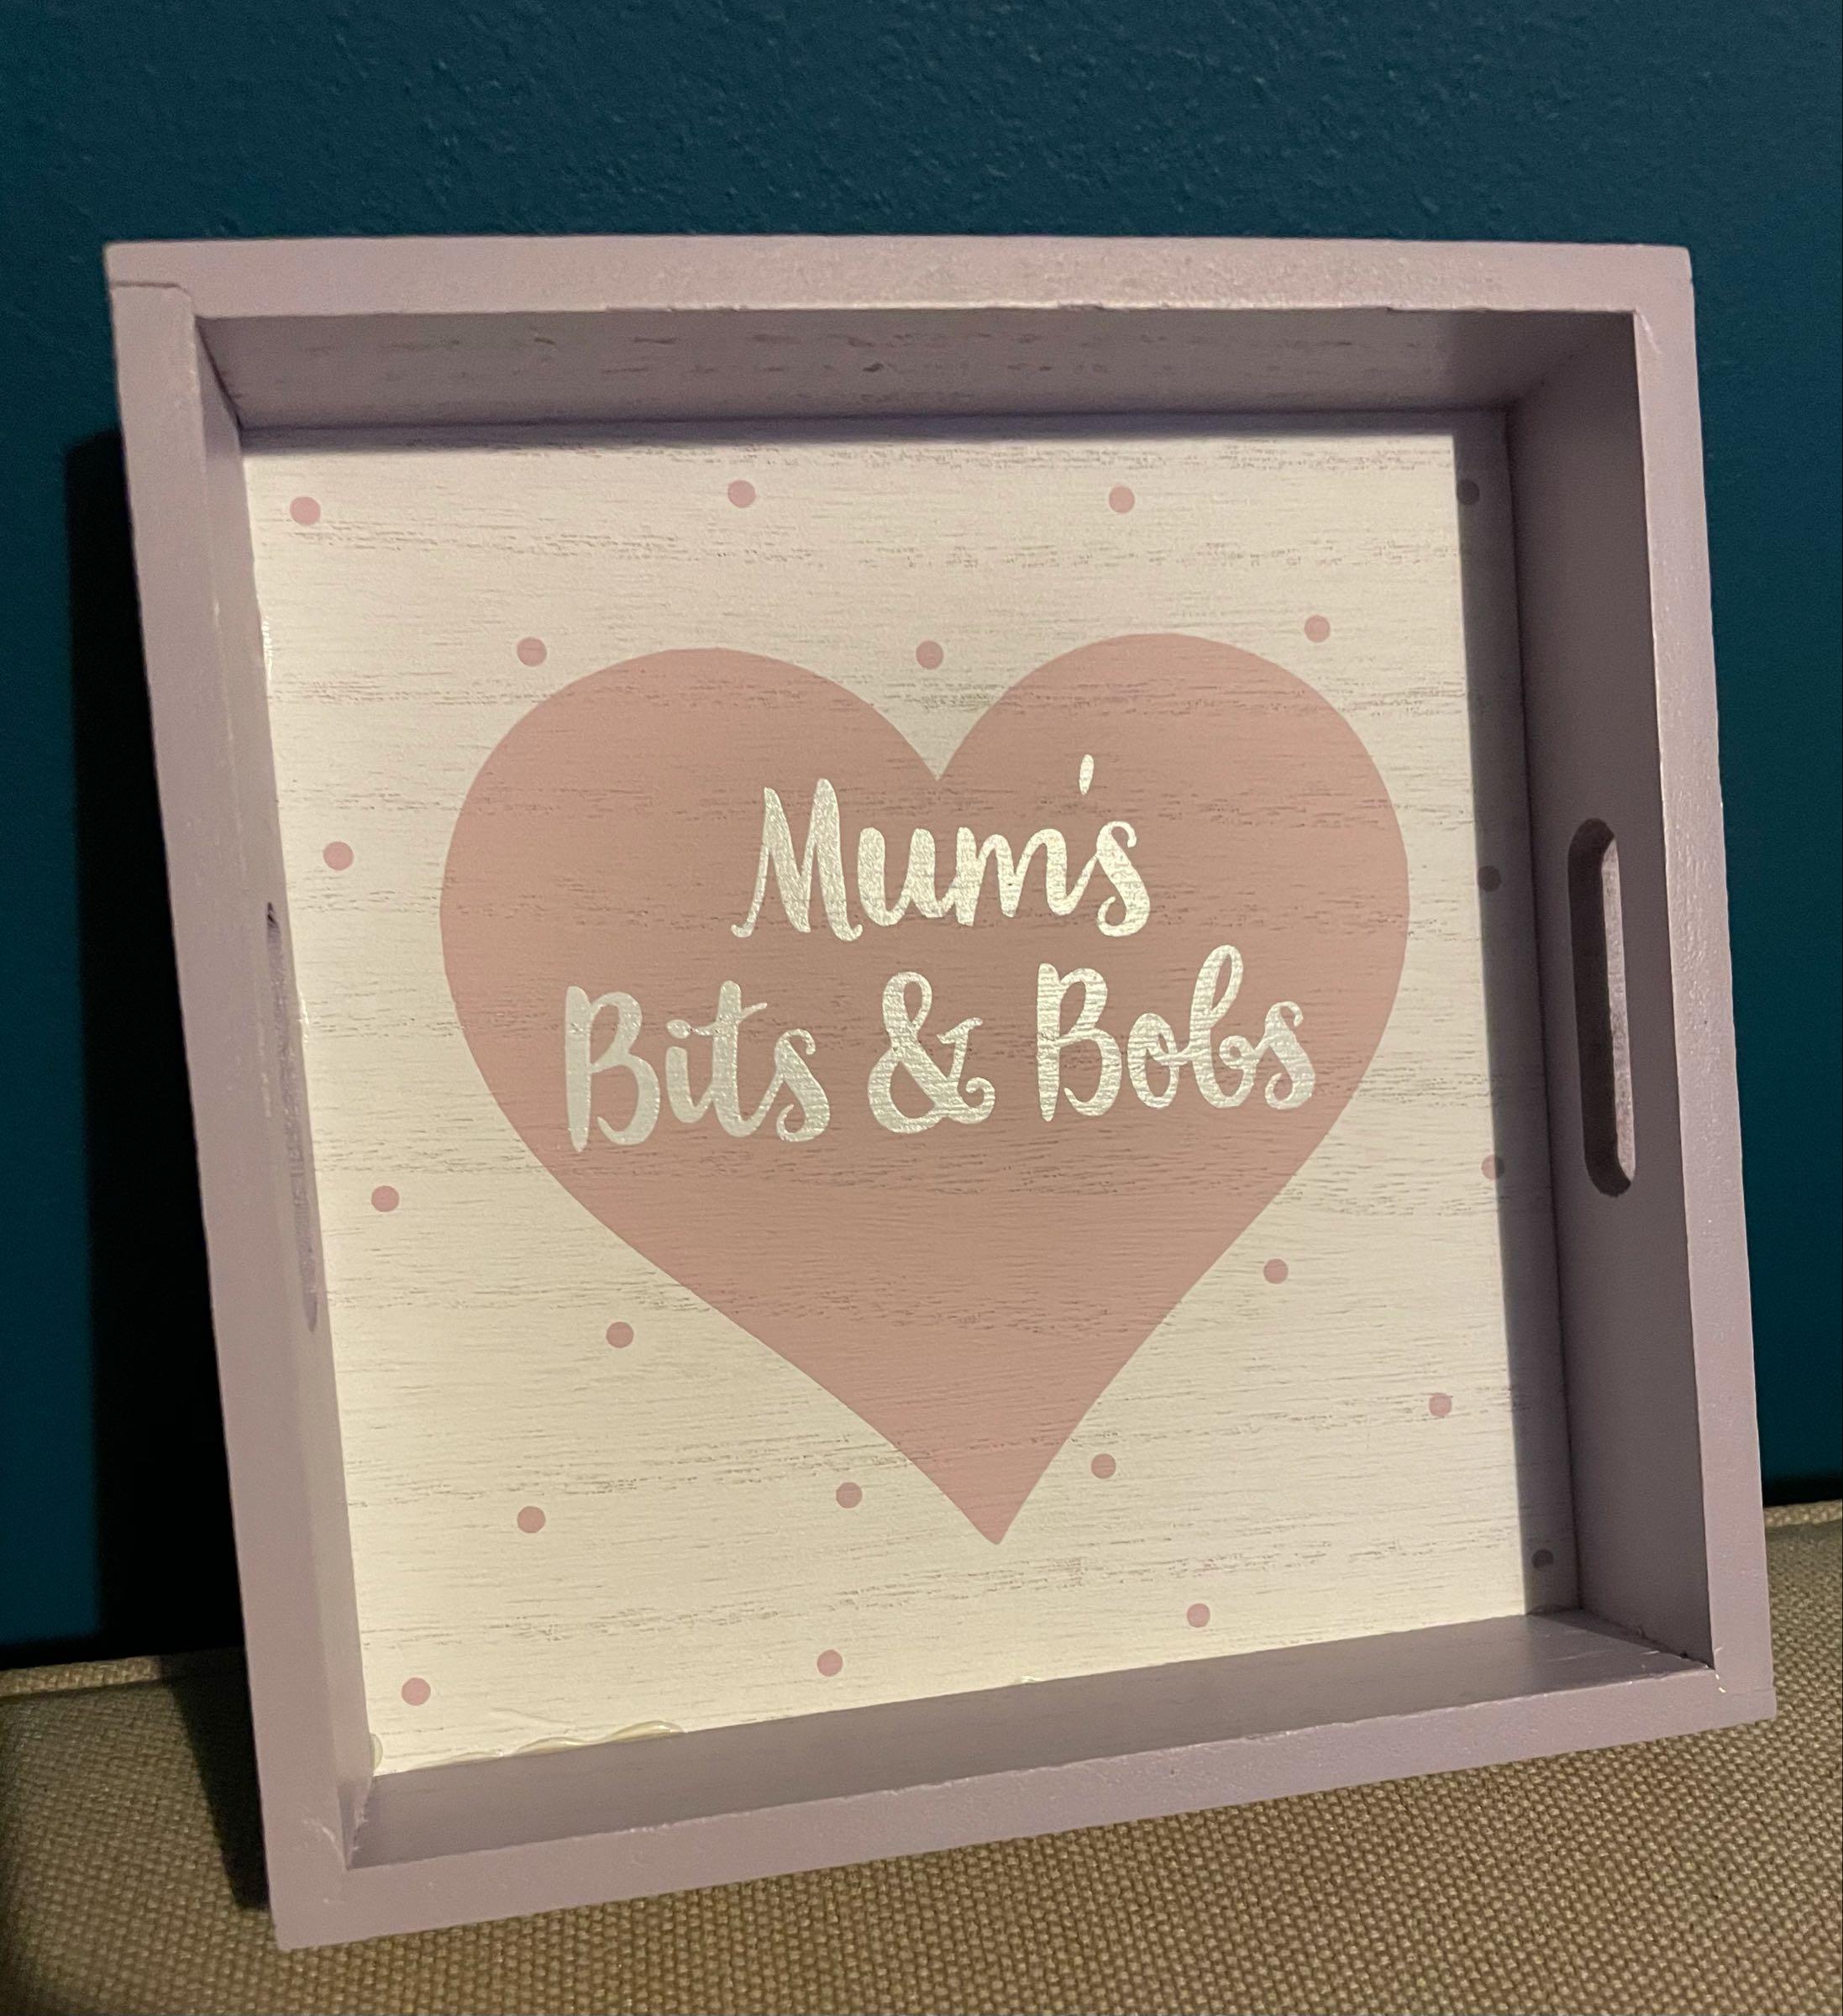 Mum's Bits & Bobs